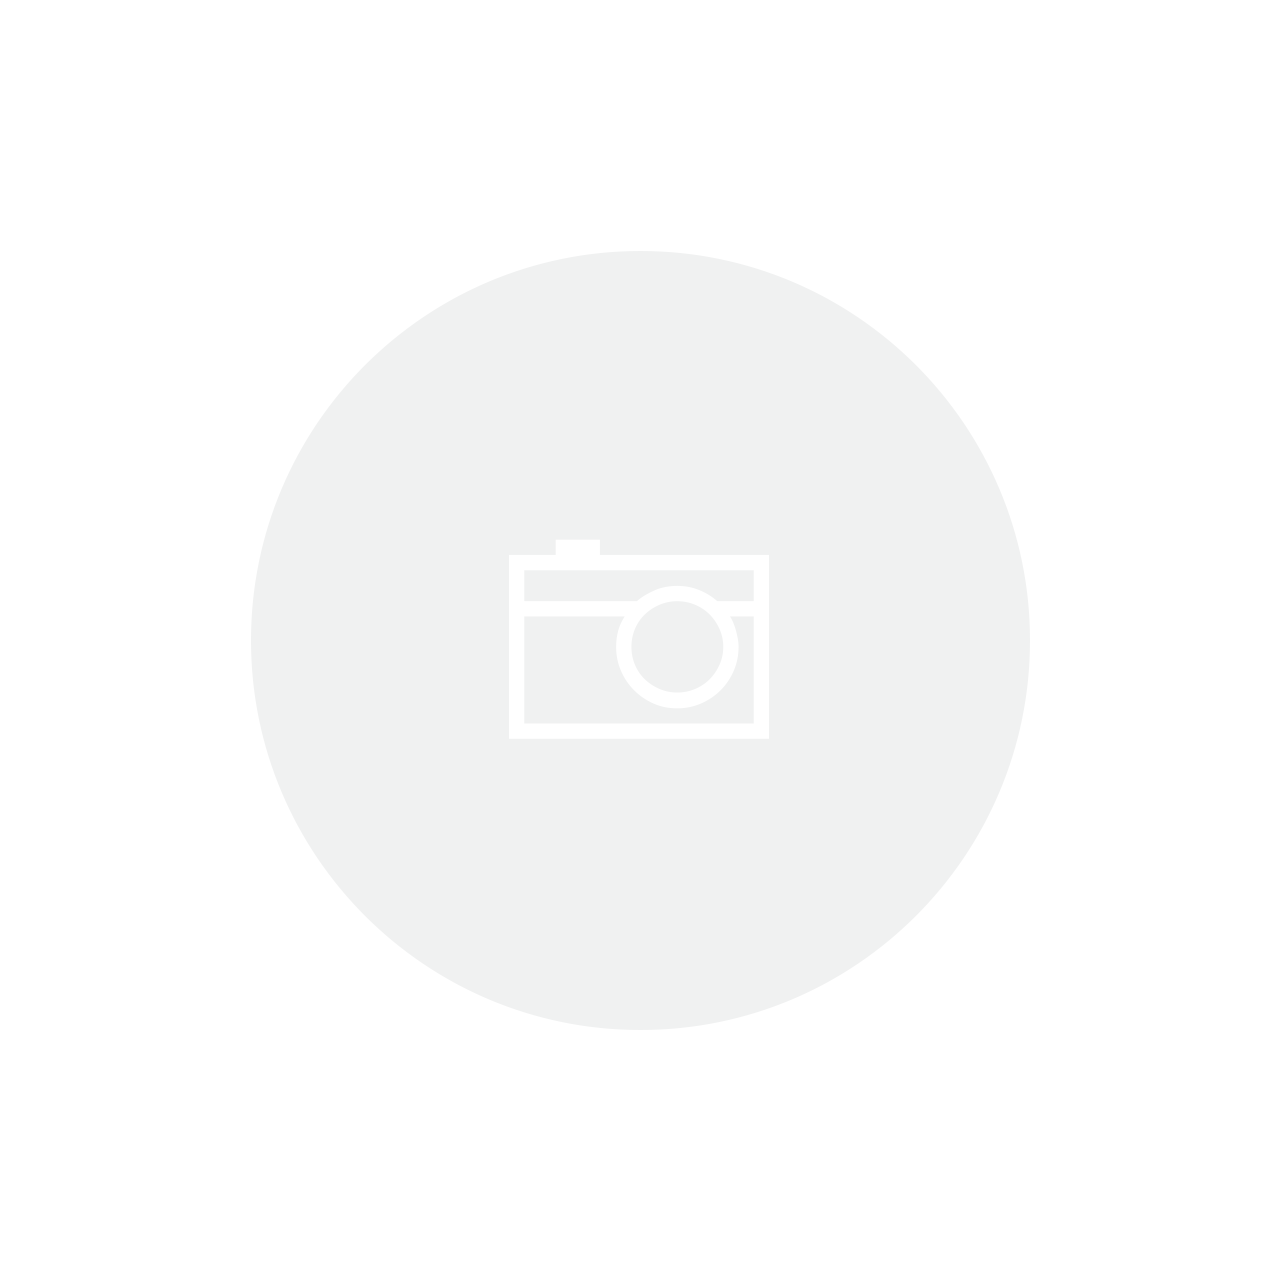 PLACA DE VIDEO SAPPHIRE PULSE RADEON RX 580 4GB 256BITS GDDR5, 11265-09-20G